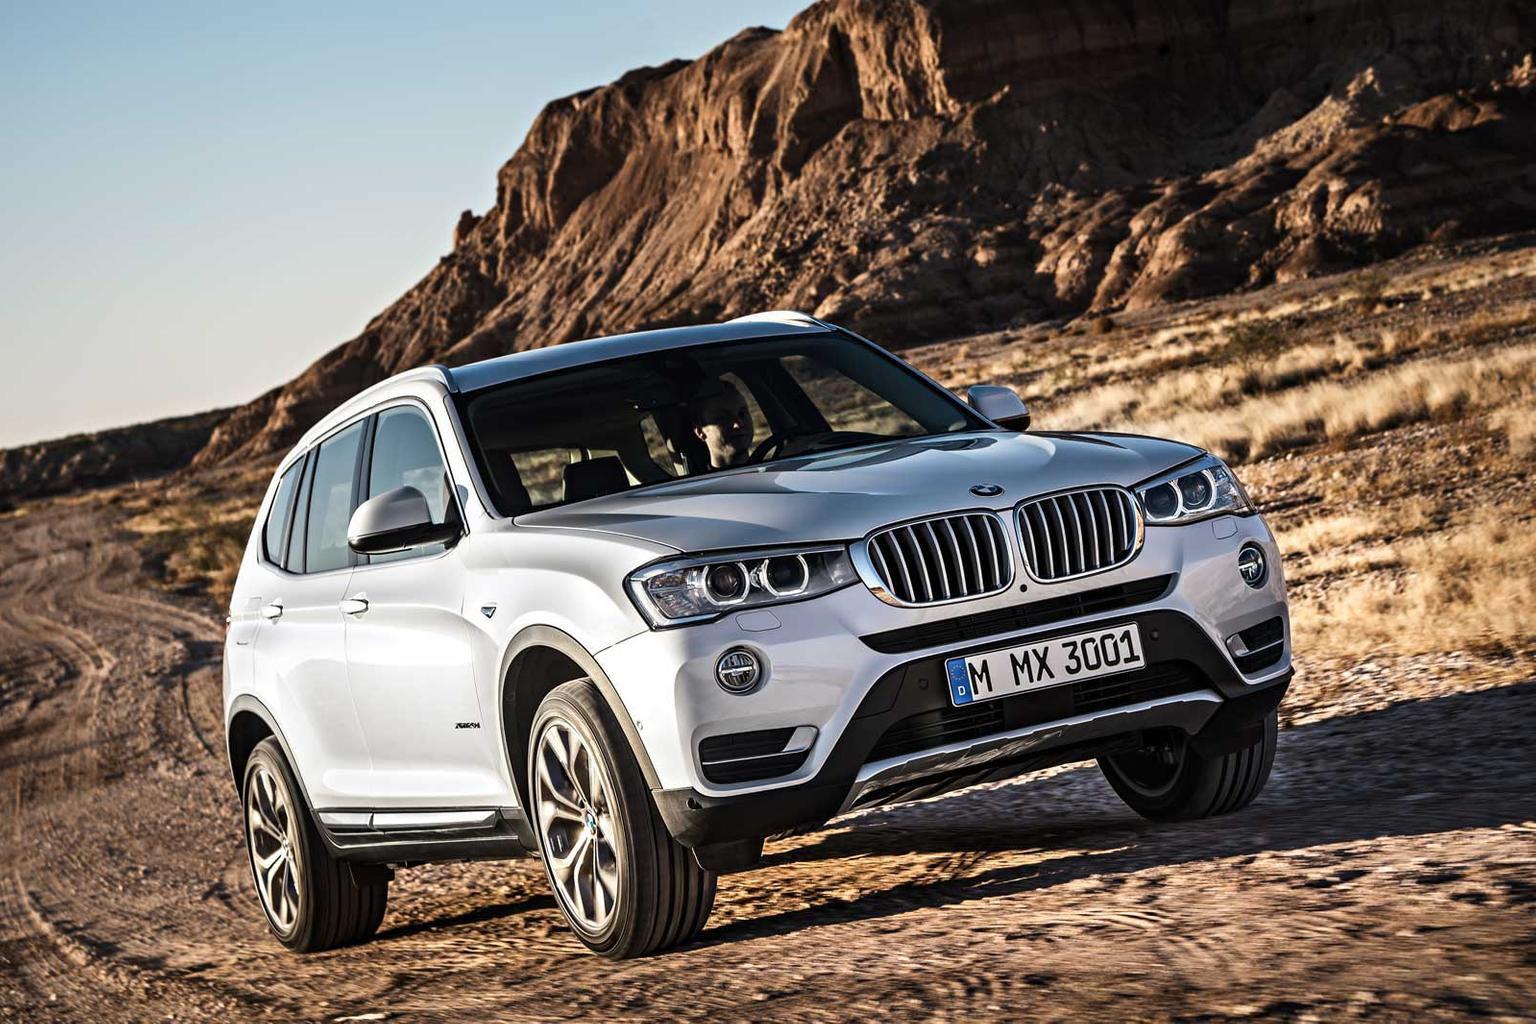 2014 BMW X3 face-lift revealed